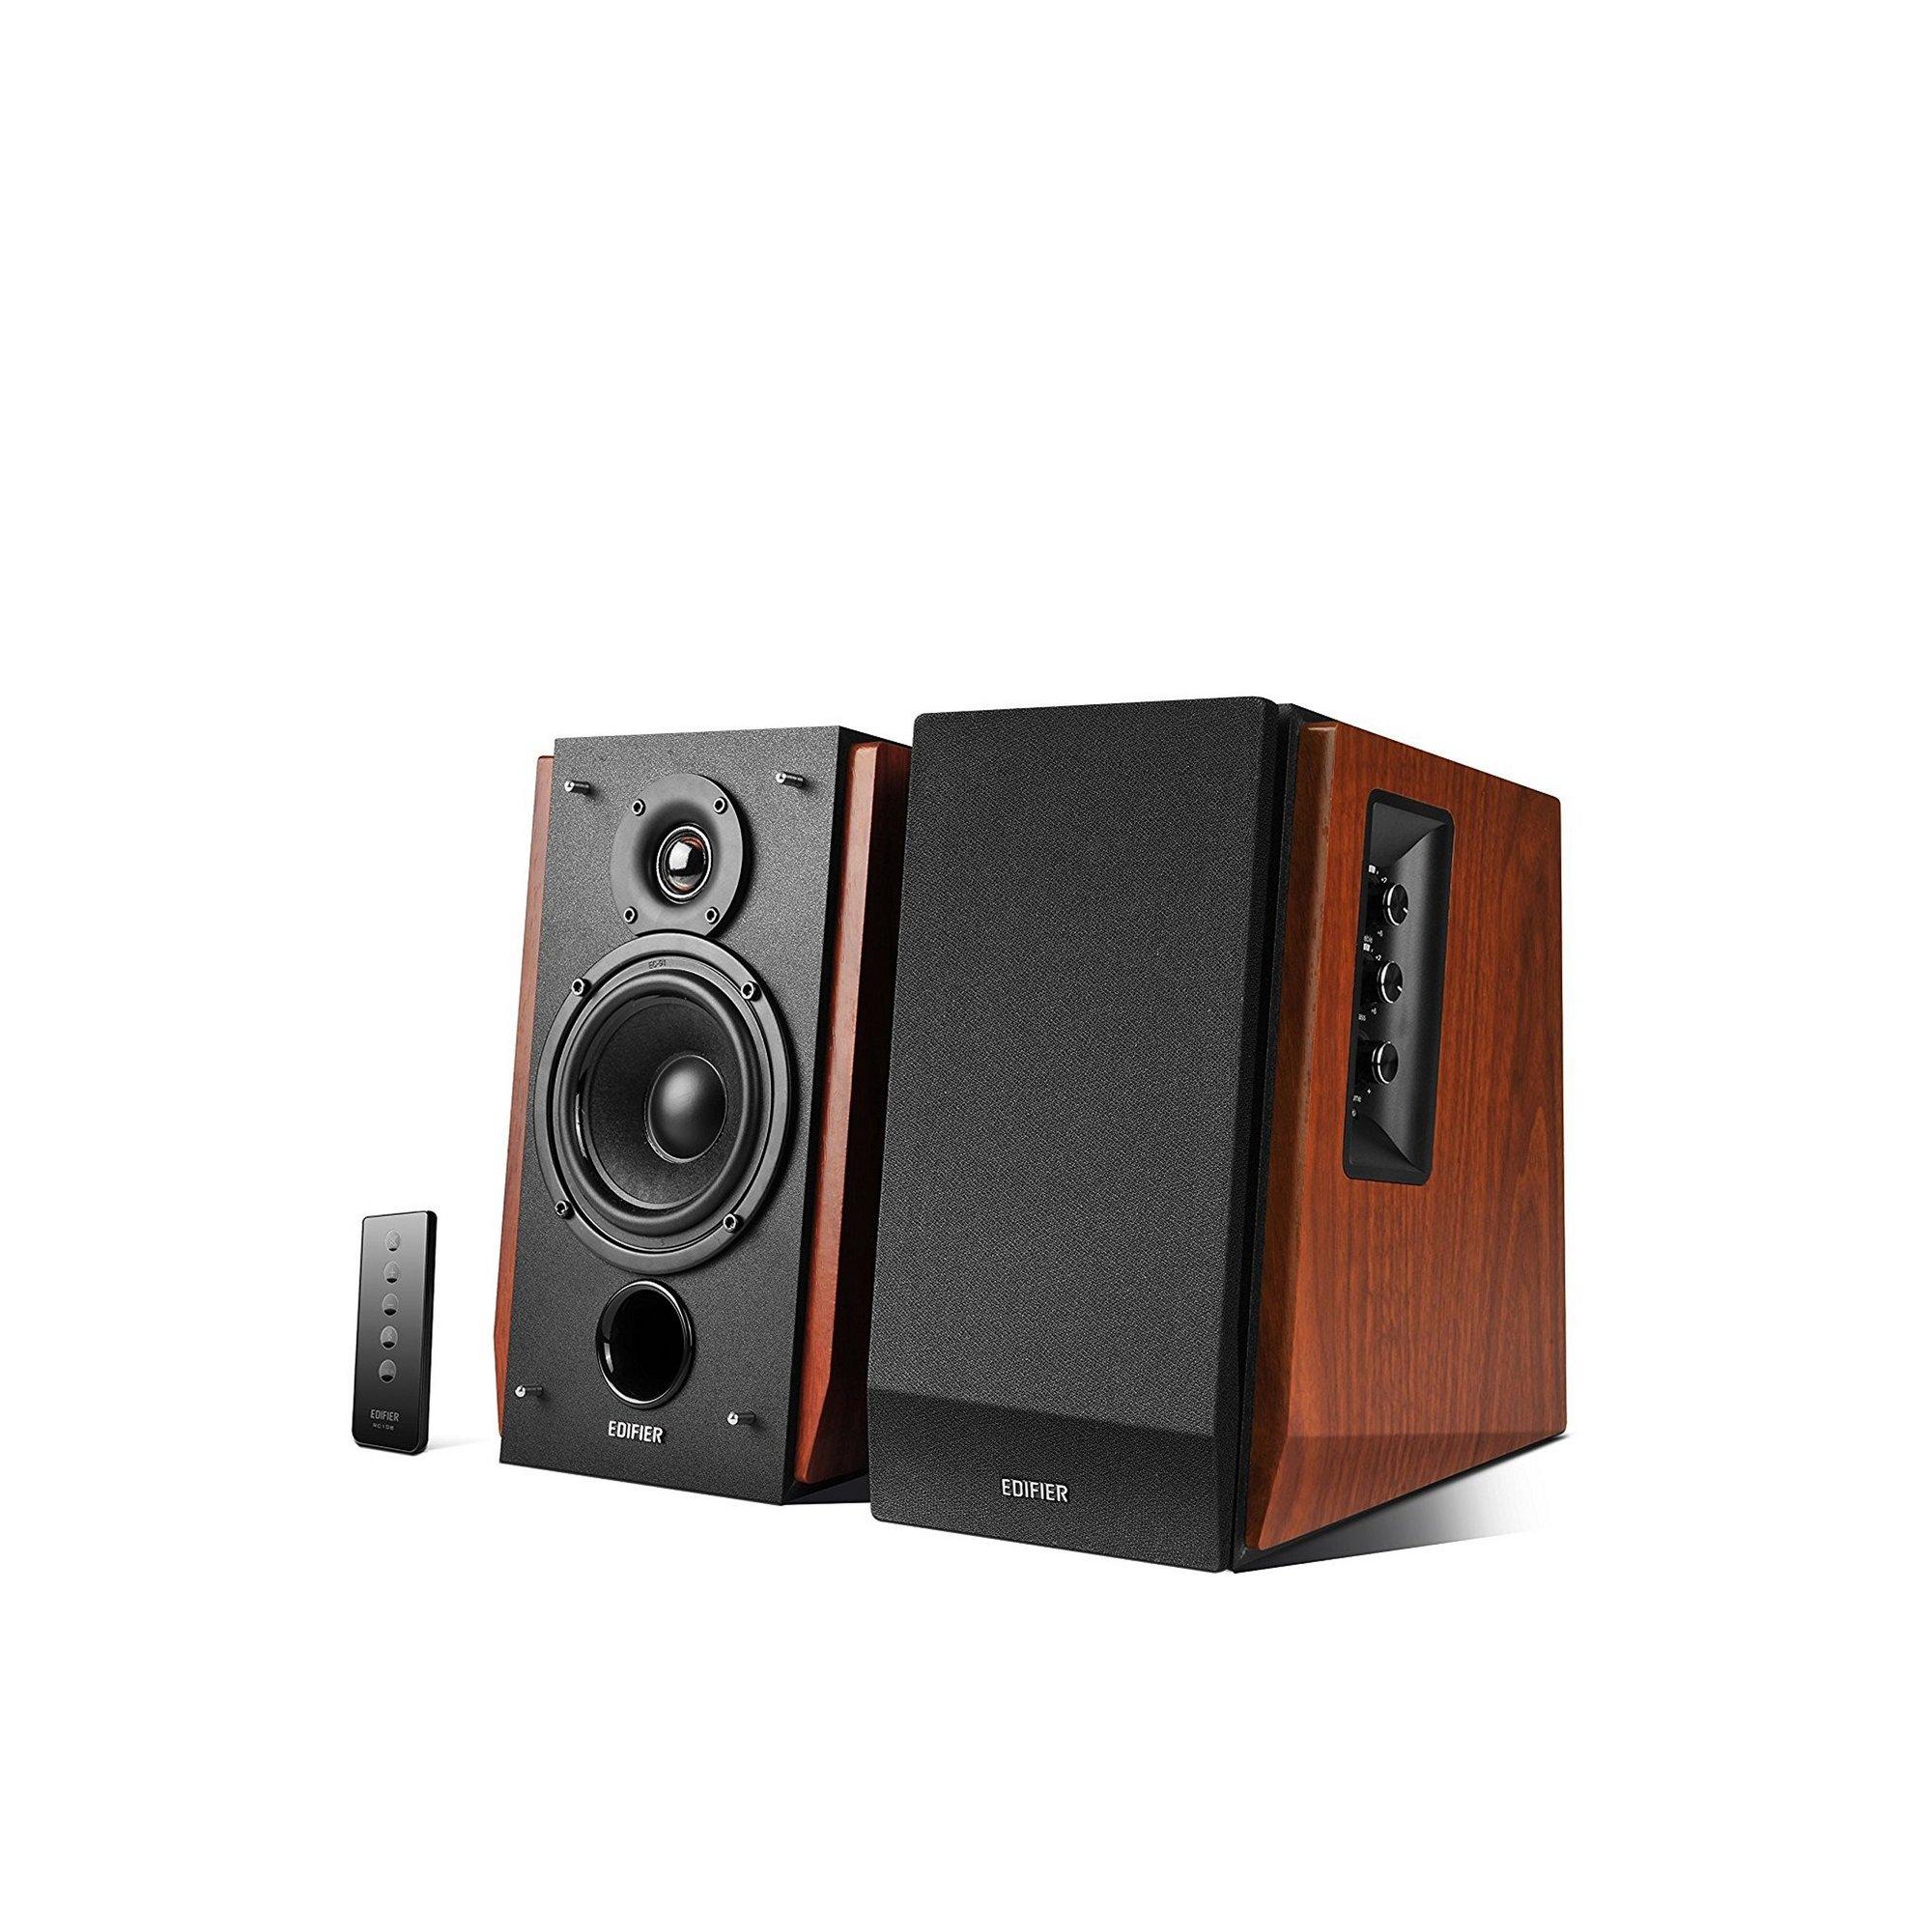 Image of Edifier Studio Bluetooth Bookshelf Speakers